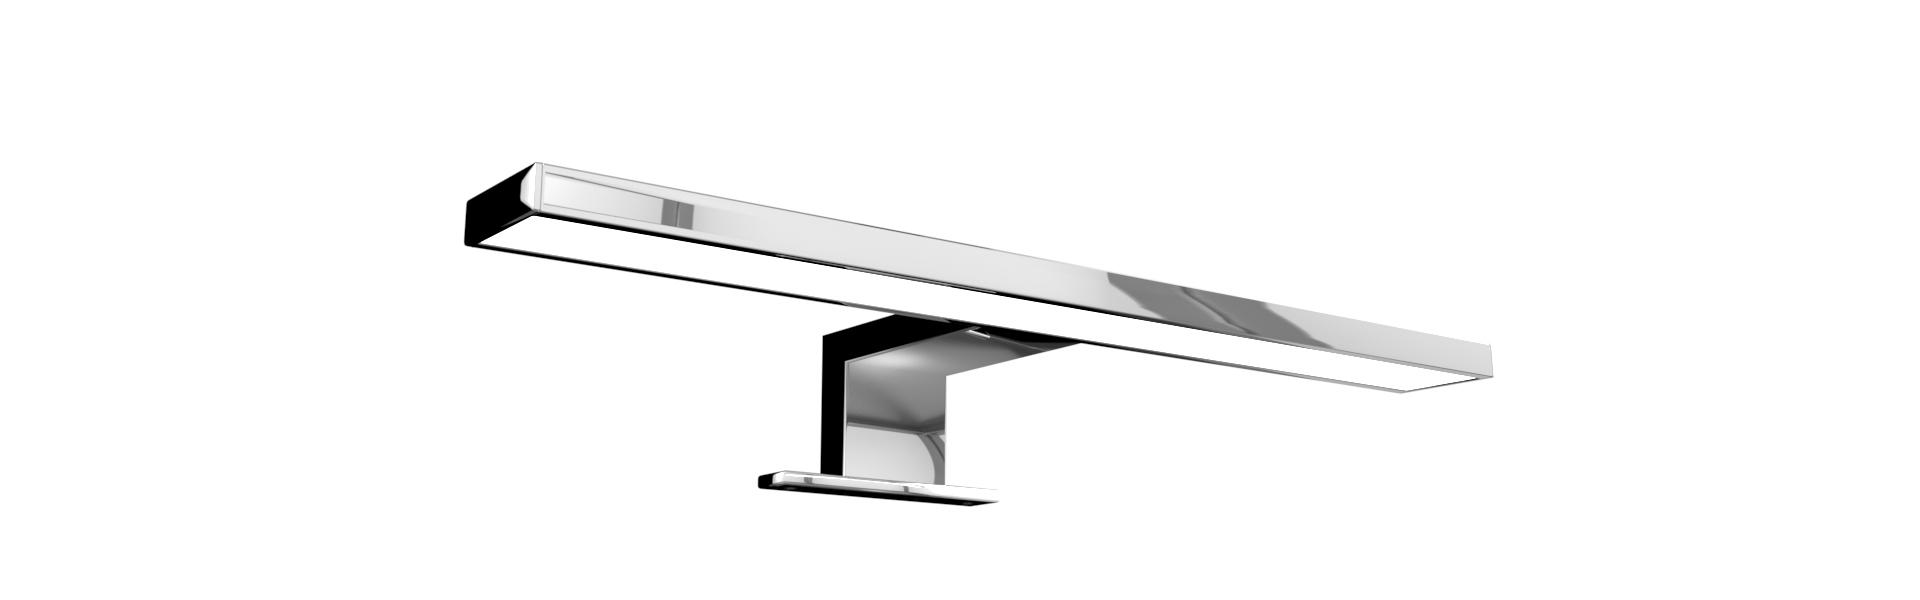 LED Lamp 30 cm